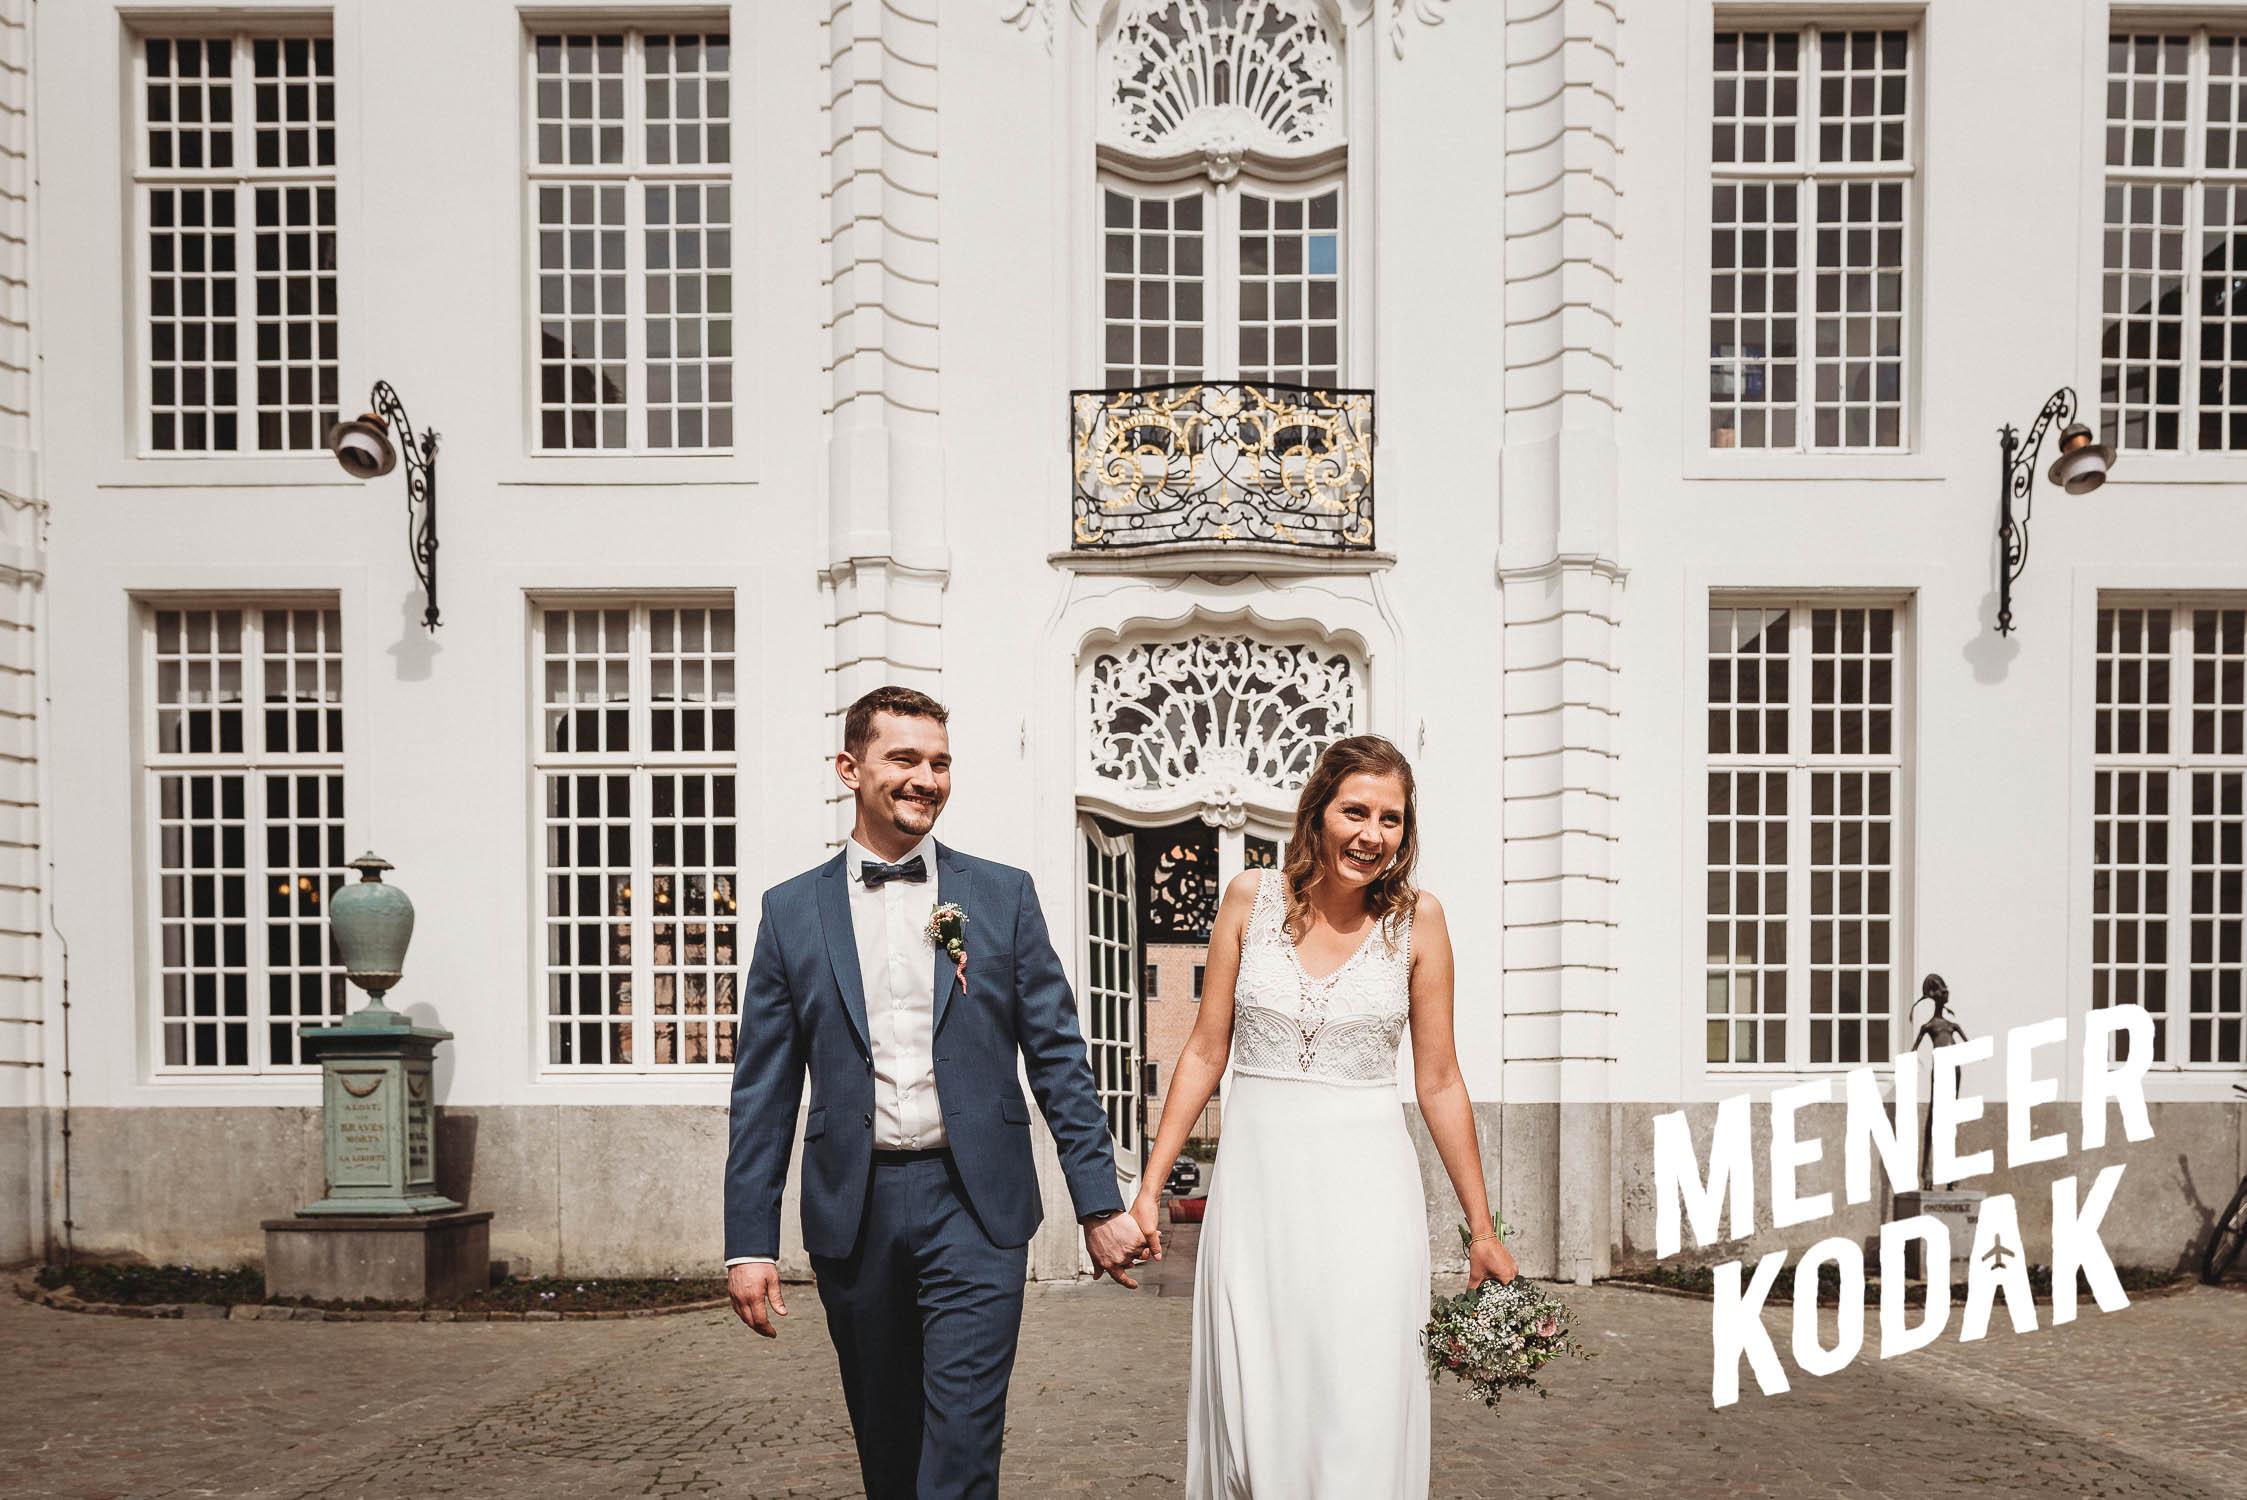 Meneer Kodak - Bruidsfotograaf - Aalst - E&L-069.jpg